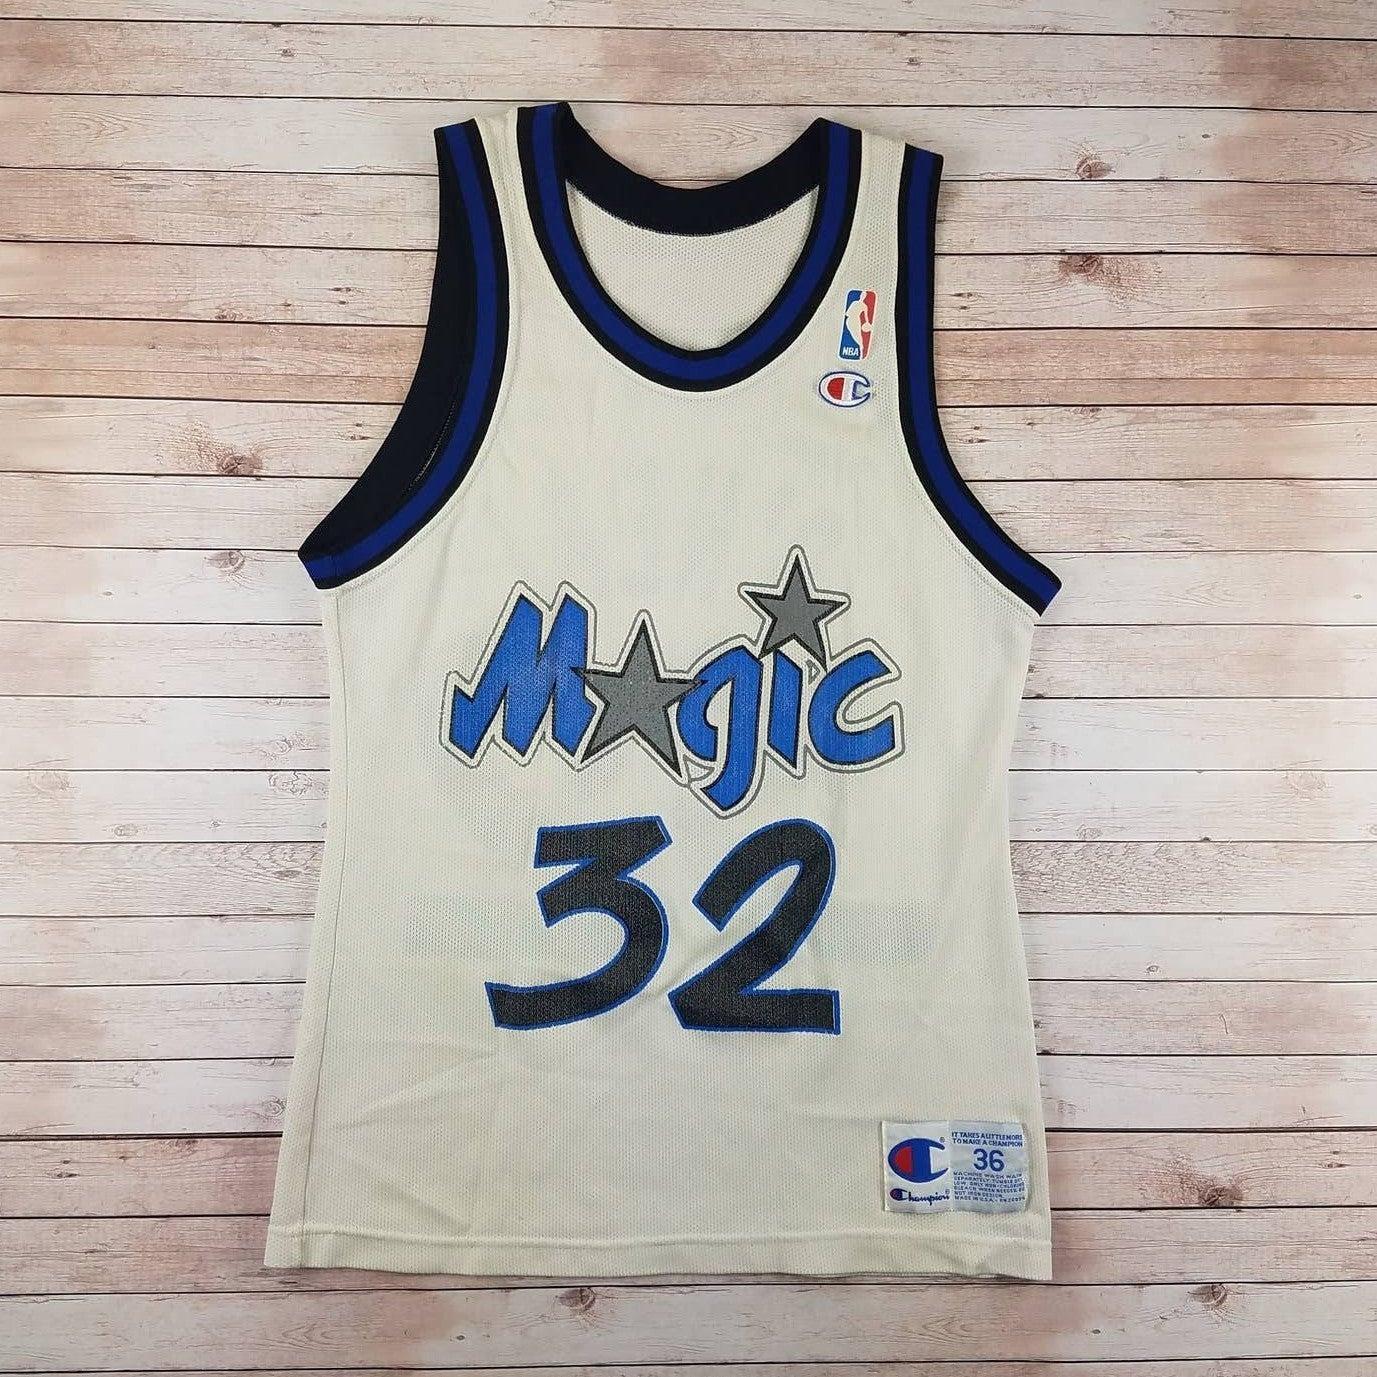 VTG 90s Shaq Magic Champion Jersey